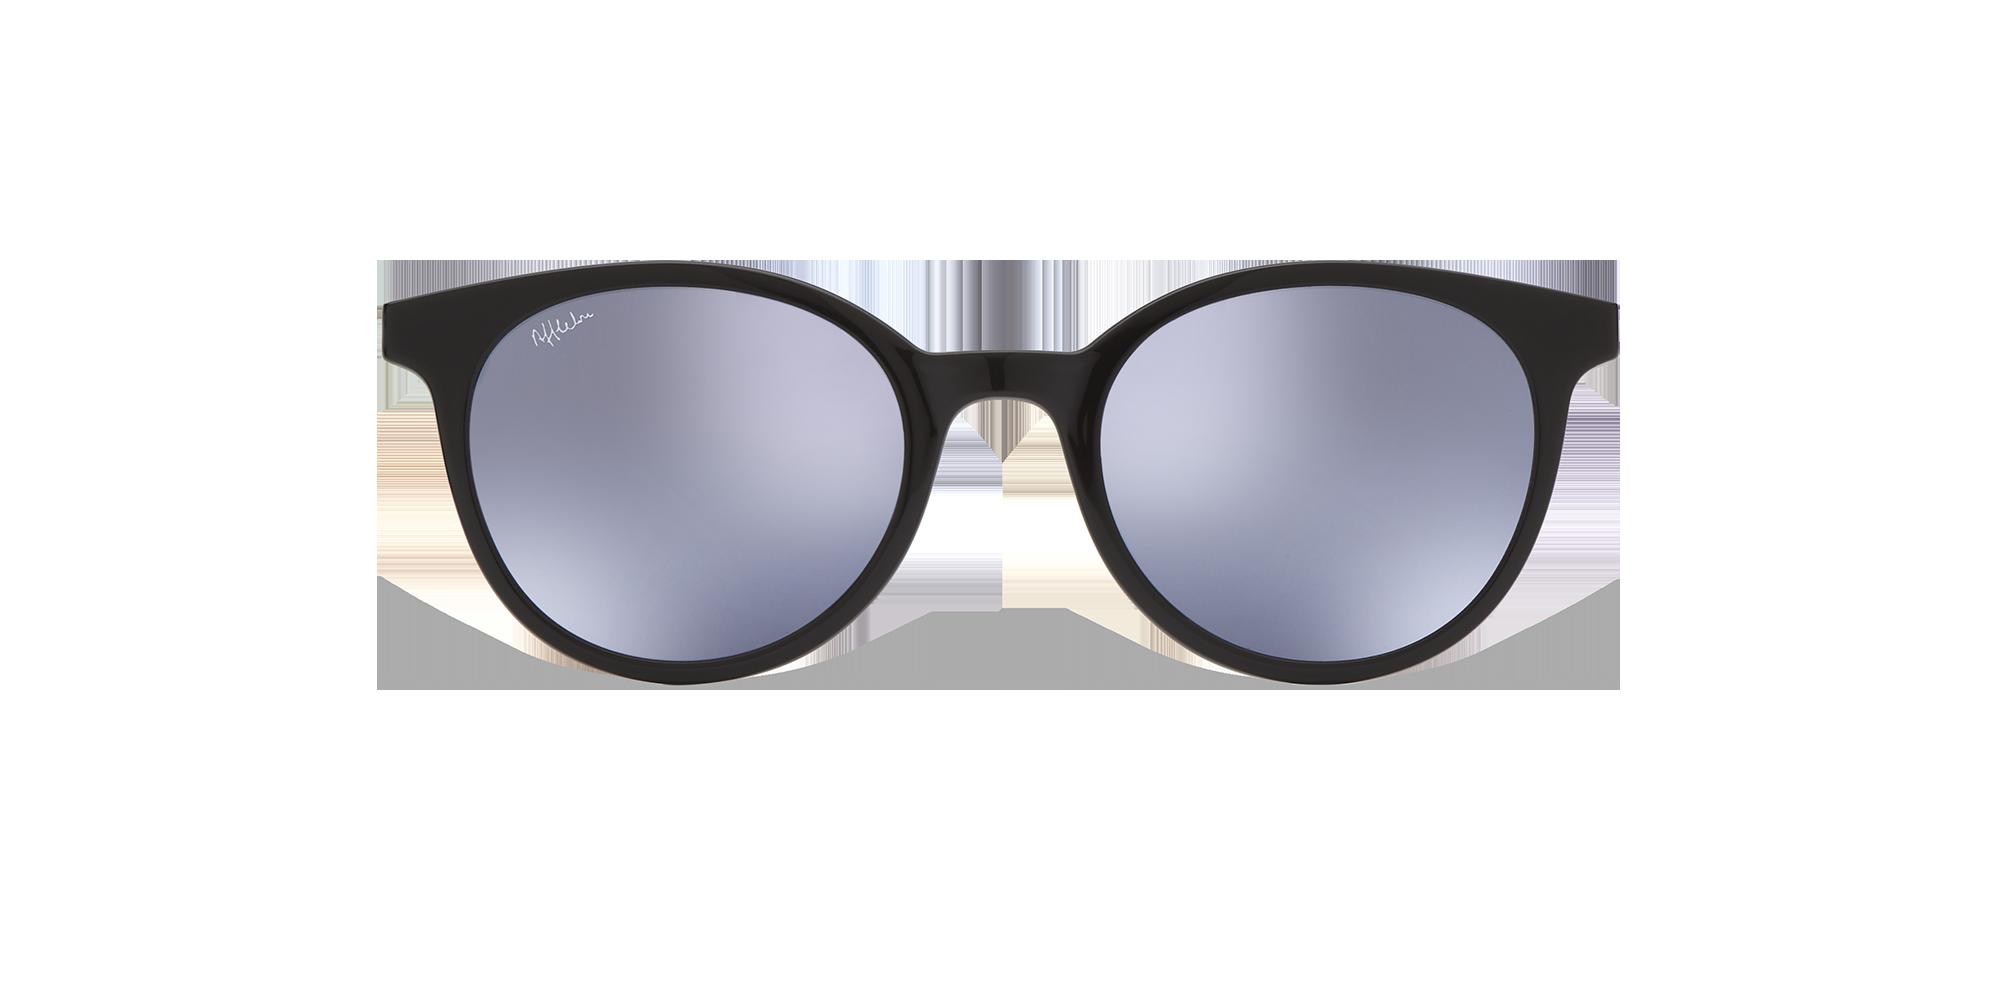 afflelou/france/products/smart_clip/clips_glasses/TMK36S4BR014819.png